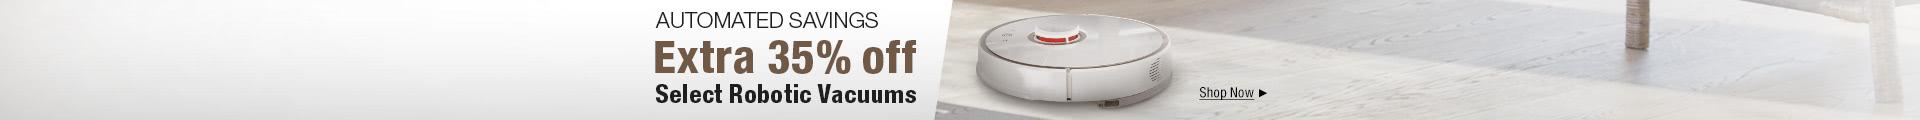 Extra 35% off Select Robotic Vacuums